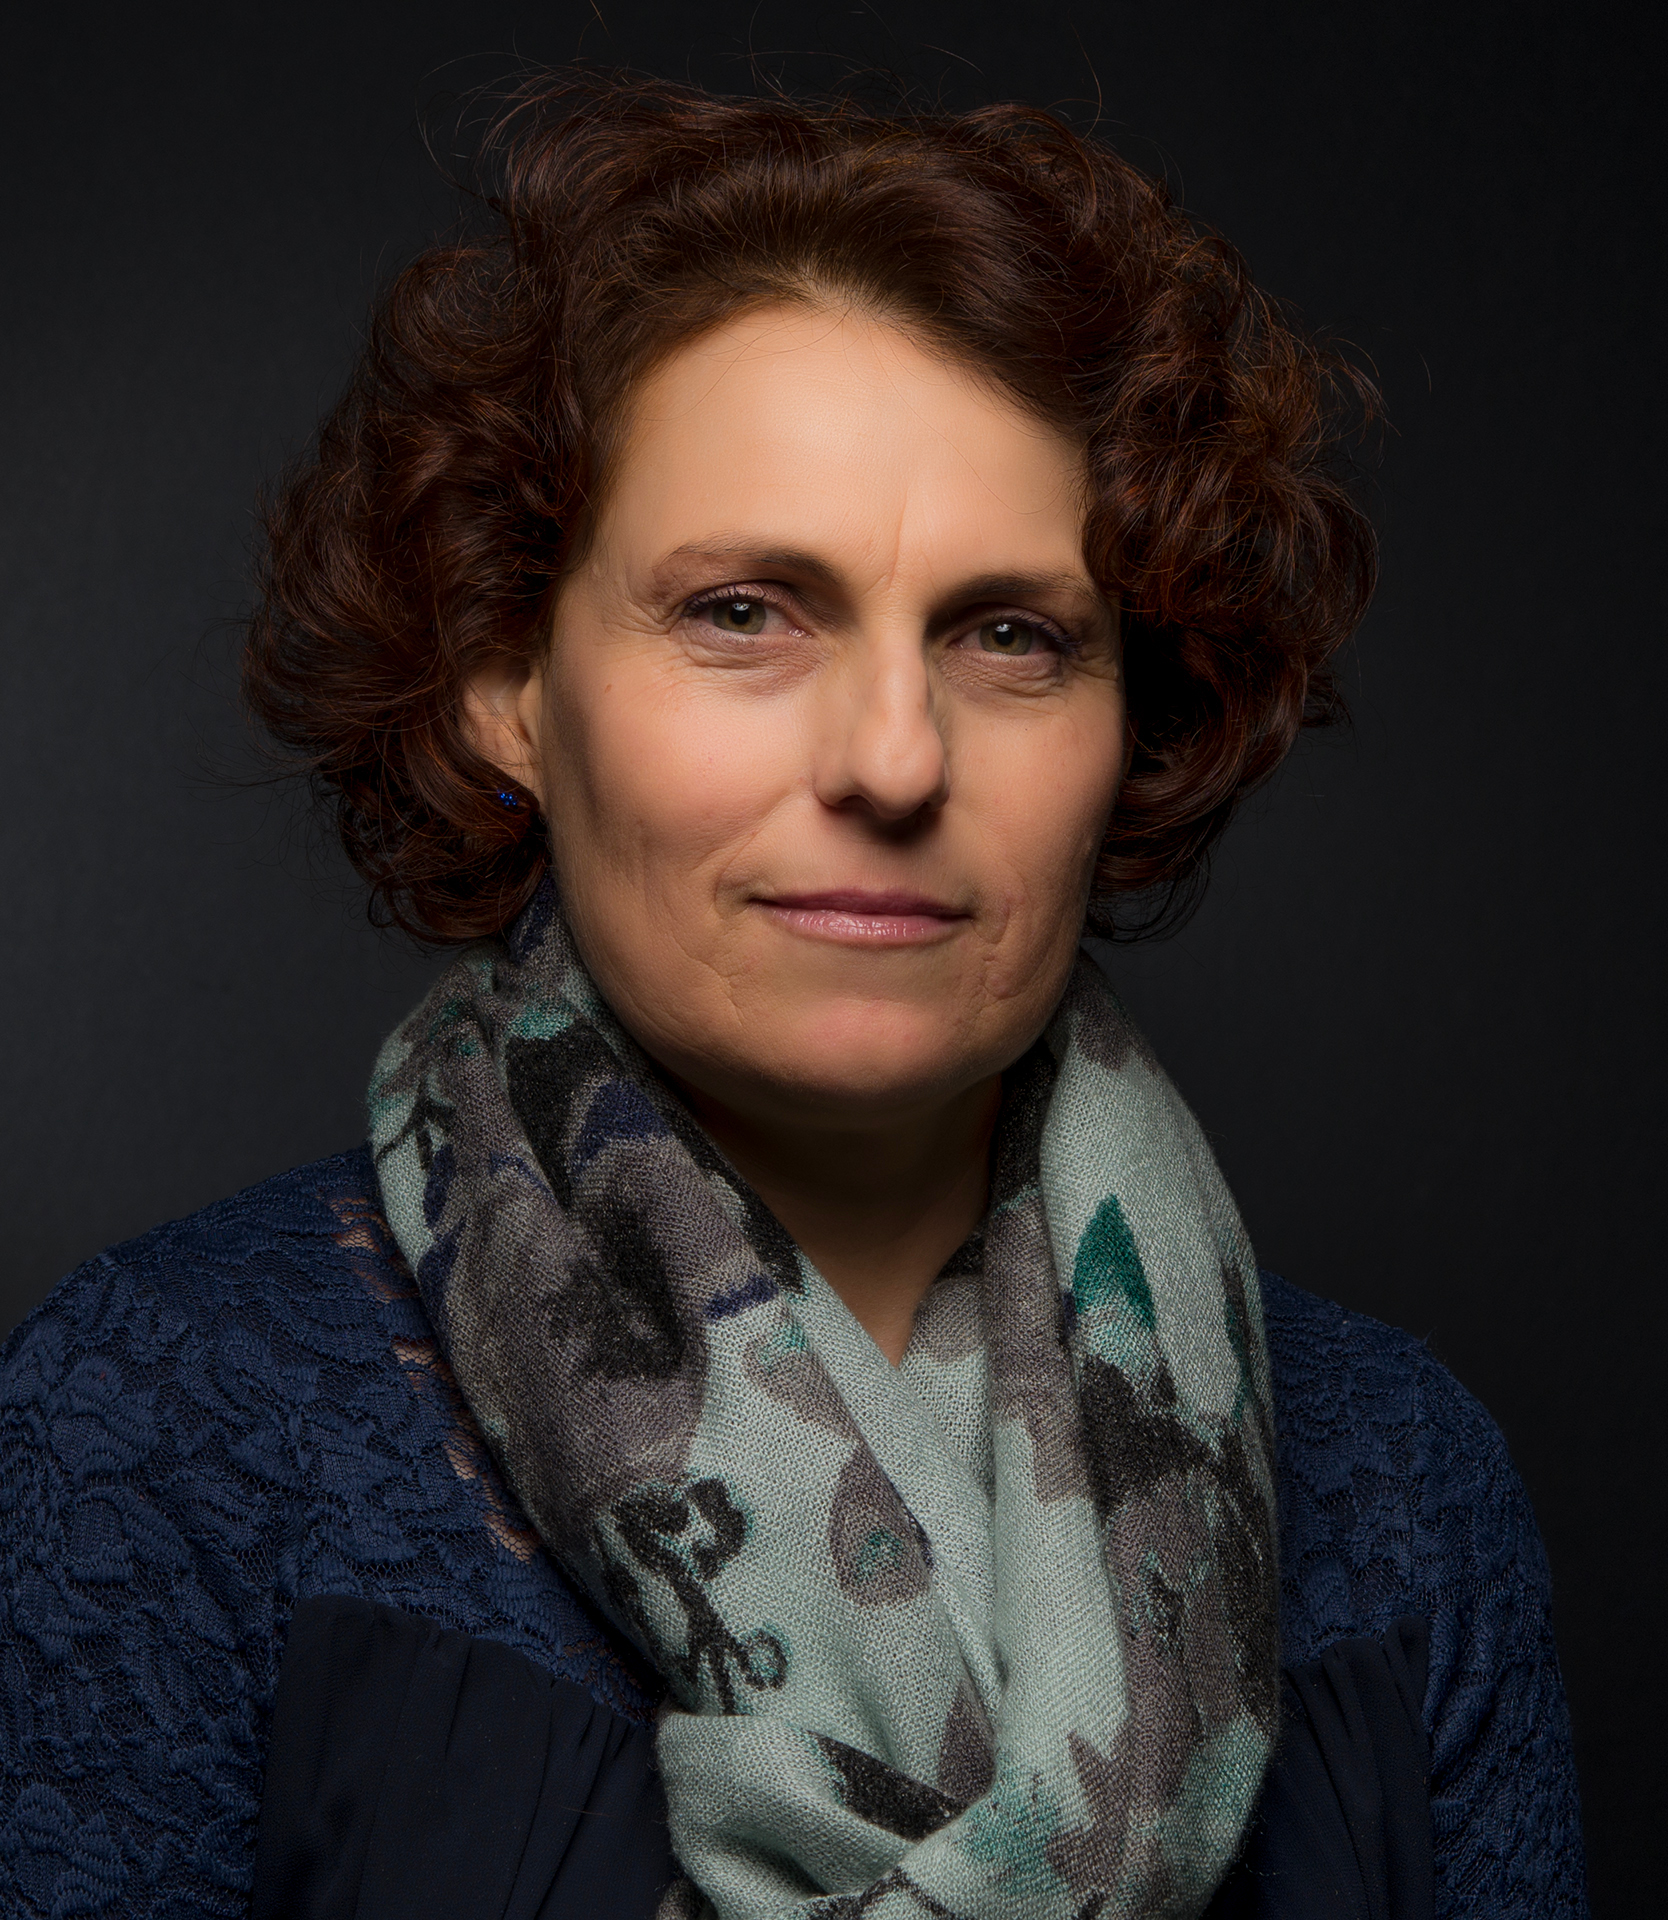 Portrait-Isabelle-Dudouet-Bercegeay